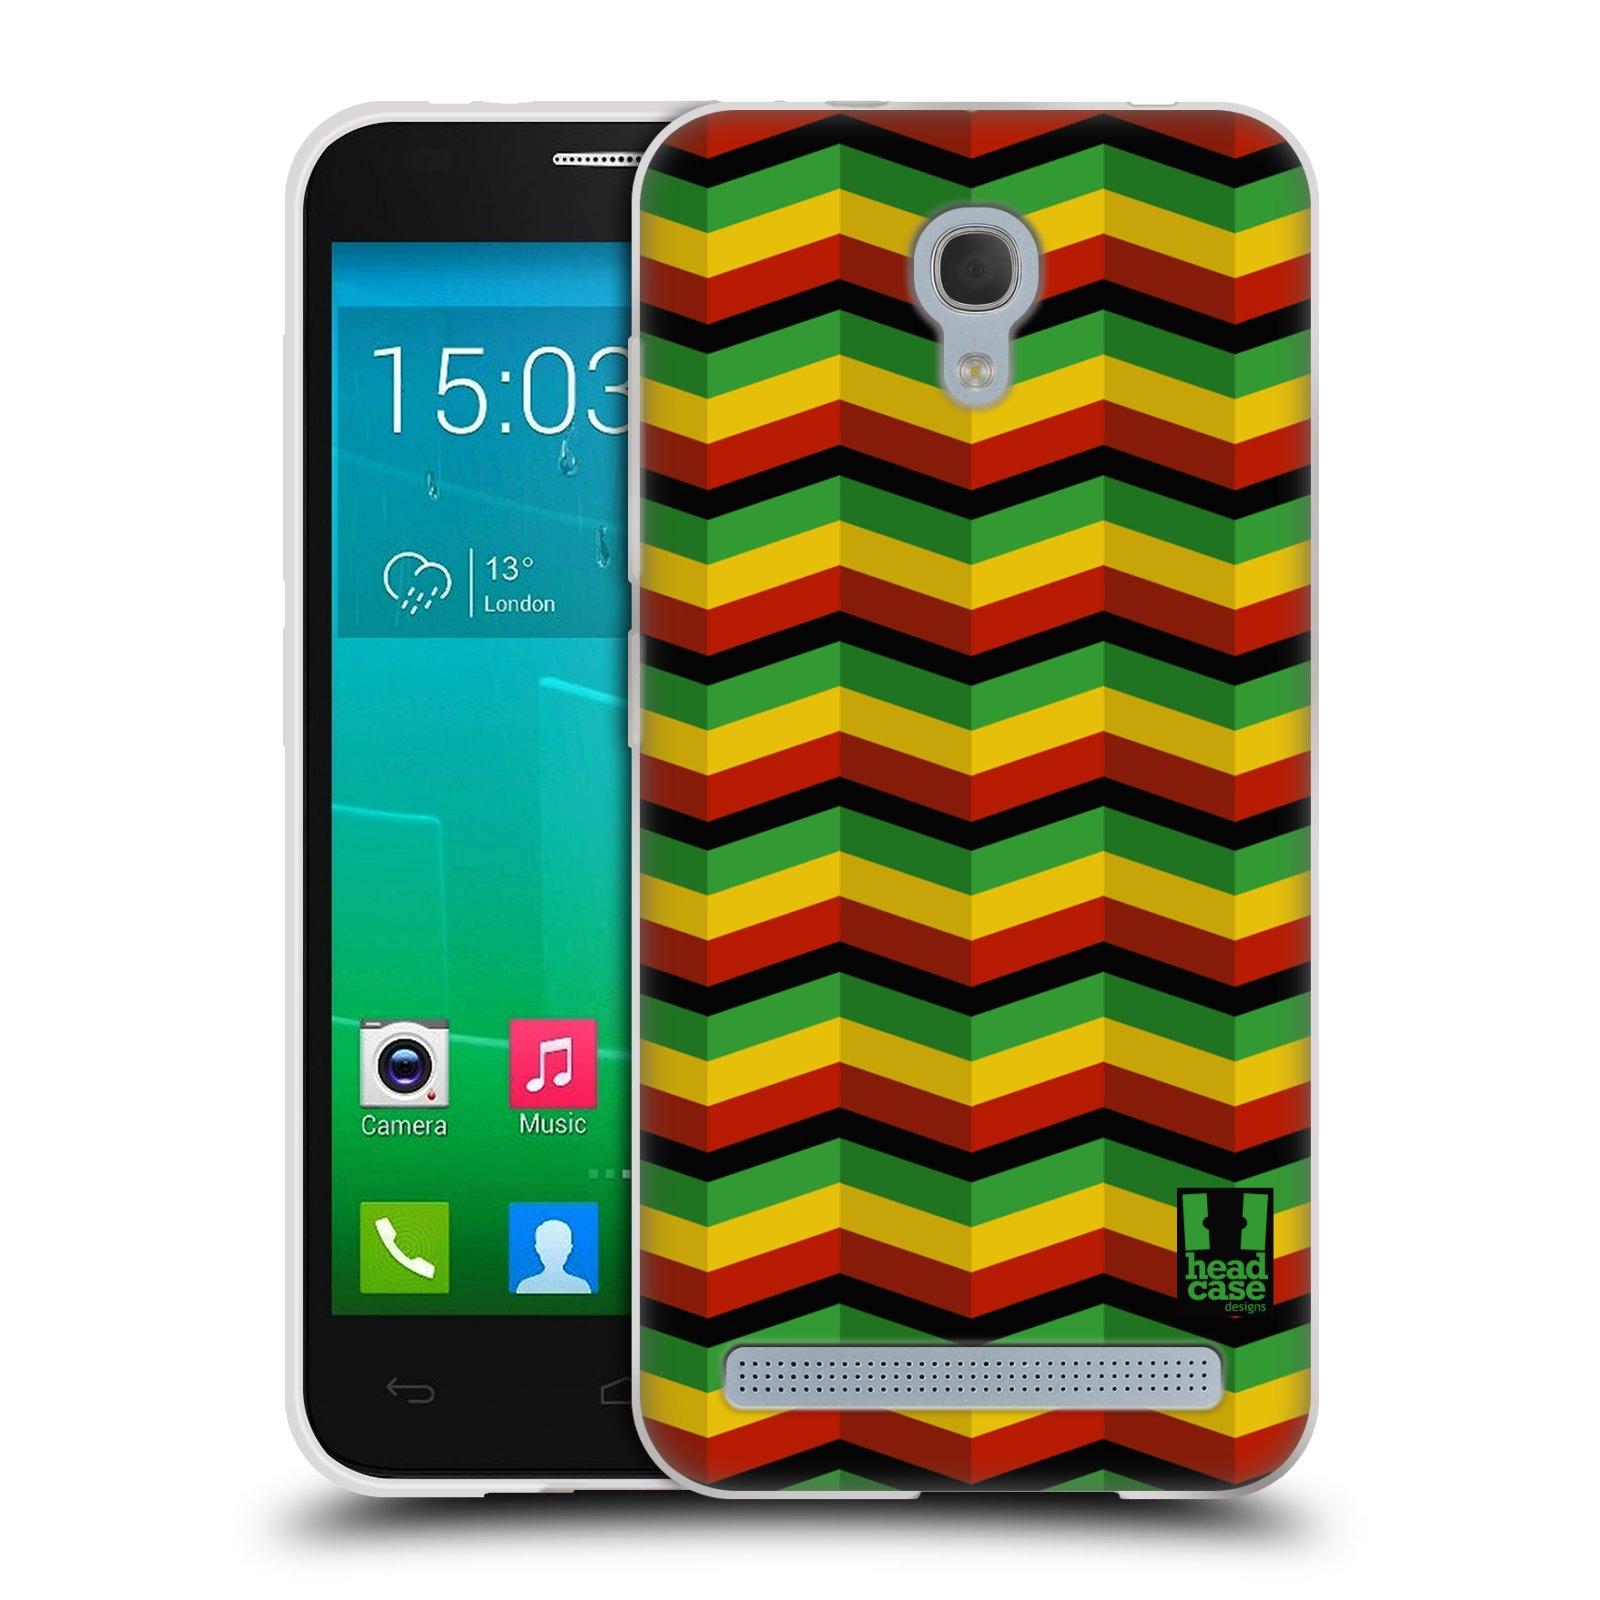 Silikonové pouzdro na mobil Alcatel One Touch Idol 2 Mini S 6036Y HEAD CASE RASTA CHEVRON (Silikonový kryt či obal na mobilní telefon Alcatel Idol 2 Mini S OT-6036Y)